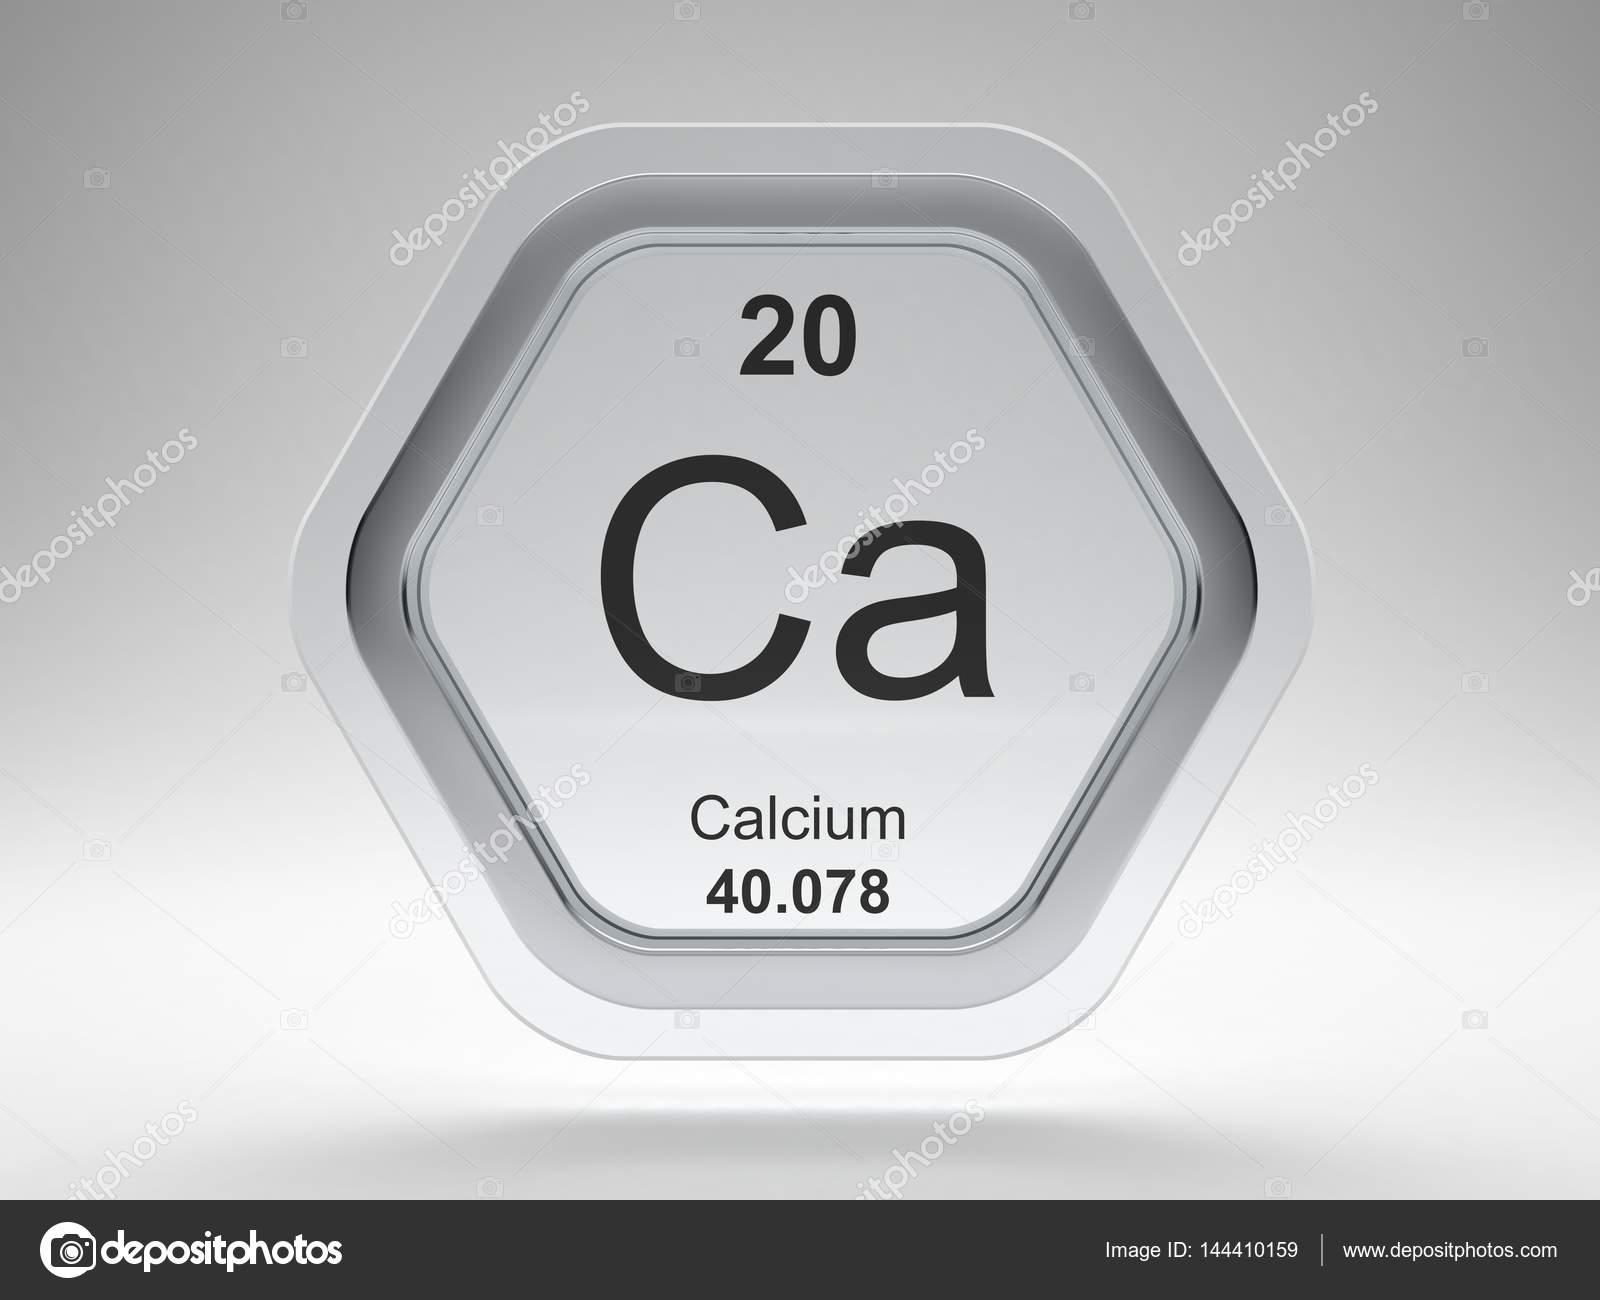 Calcium chemical element symbol stock photo conceptw 144410159 calcium chemical element symbol stock photo buycottarizona